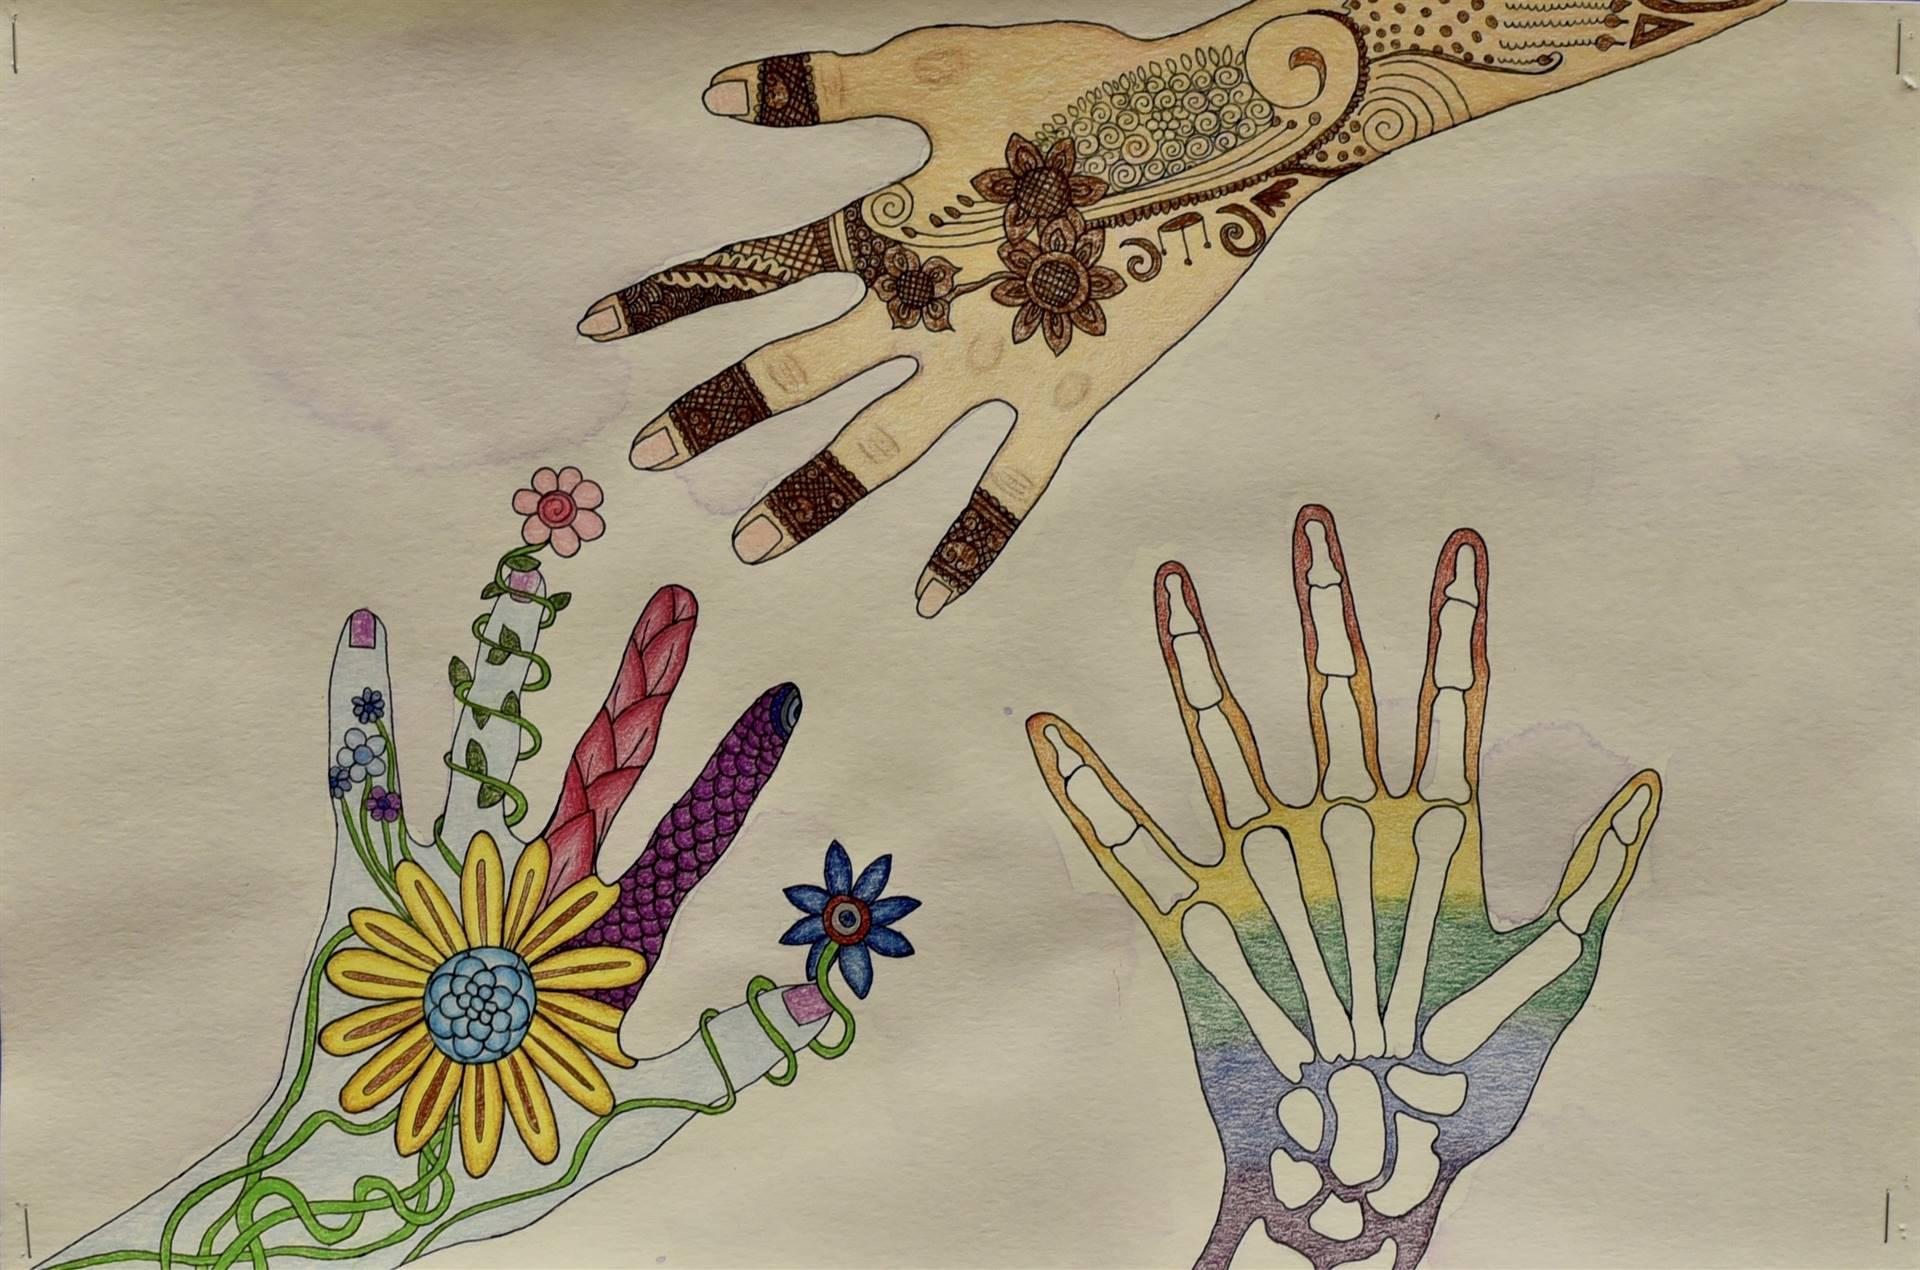 Brecksville-Broadview Hts. Middle School Art Projects 49